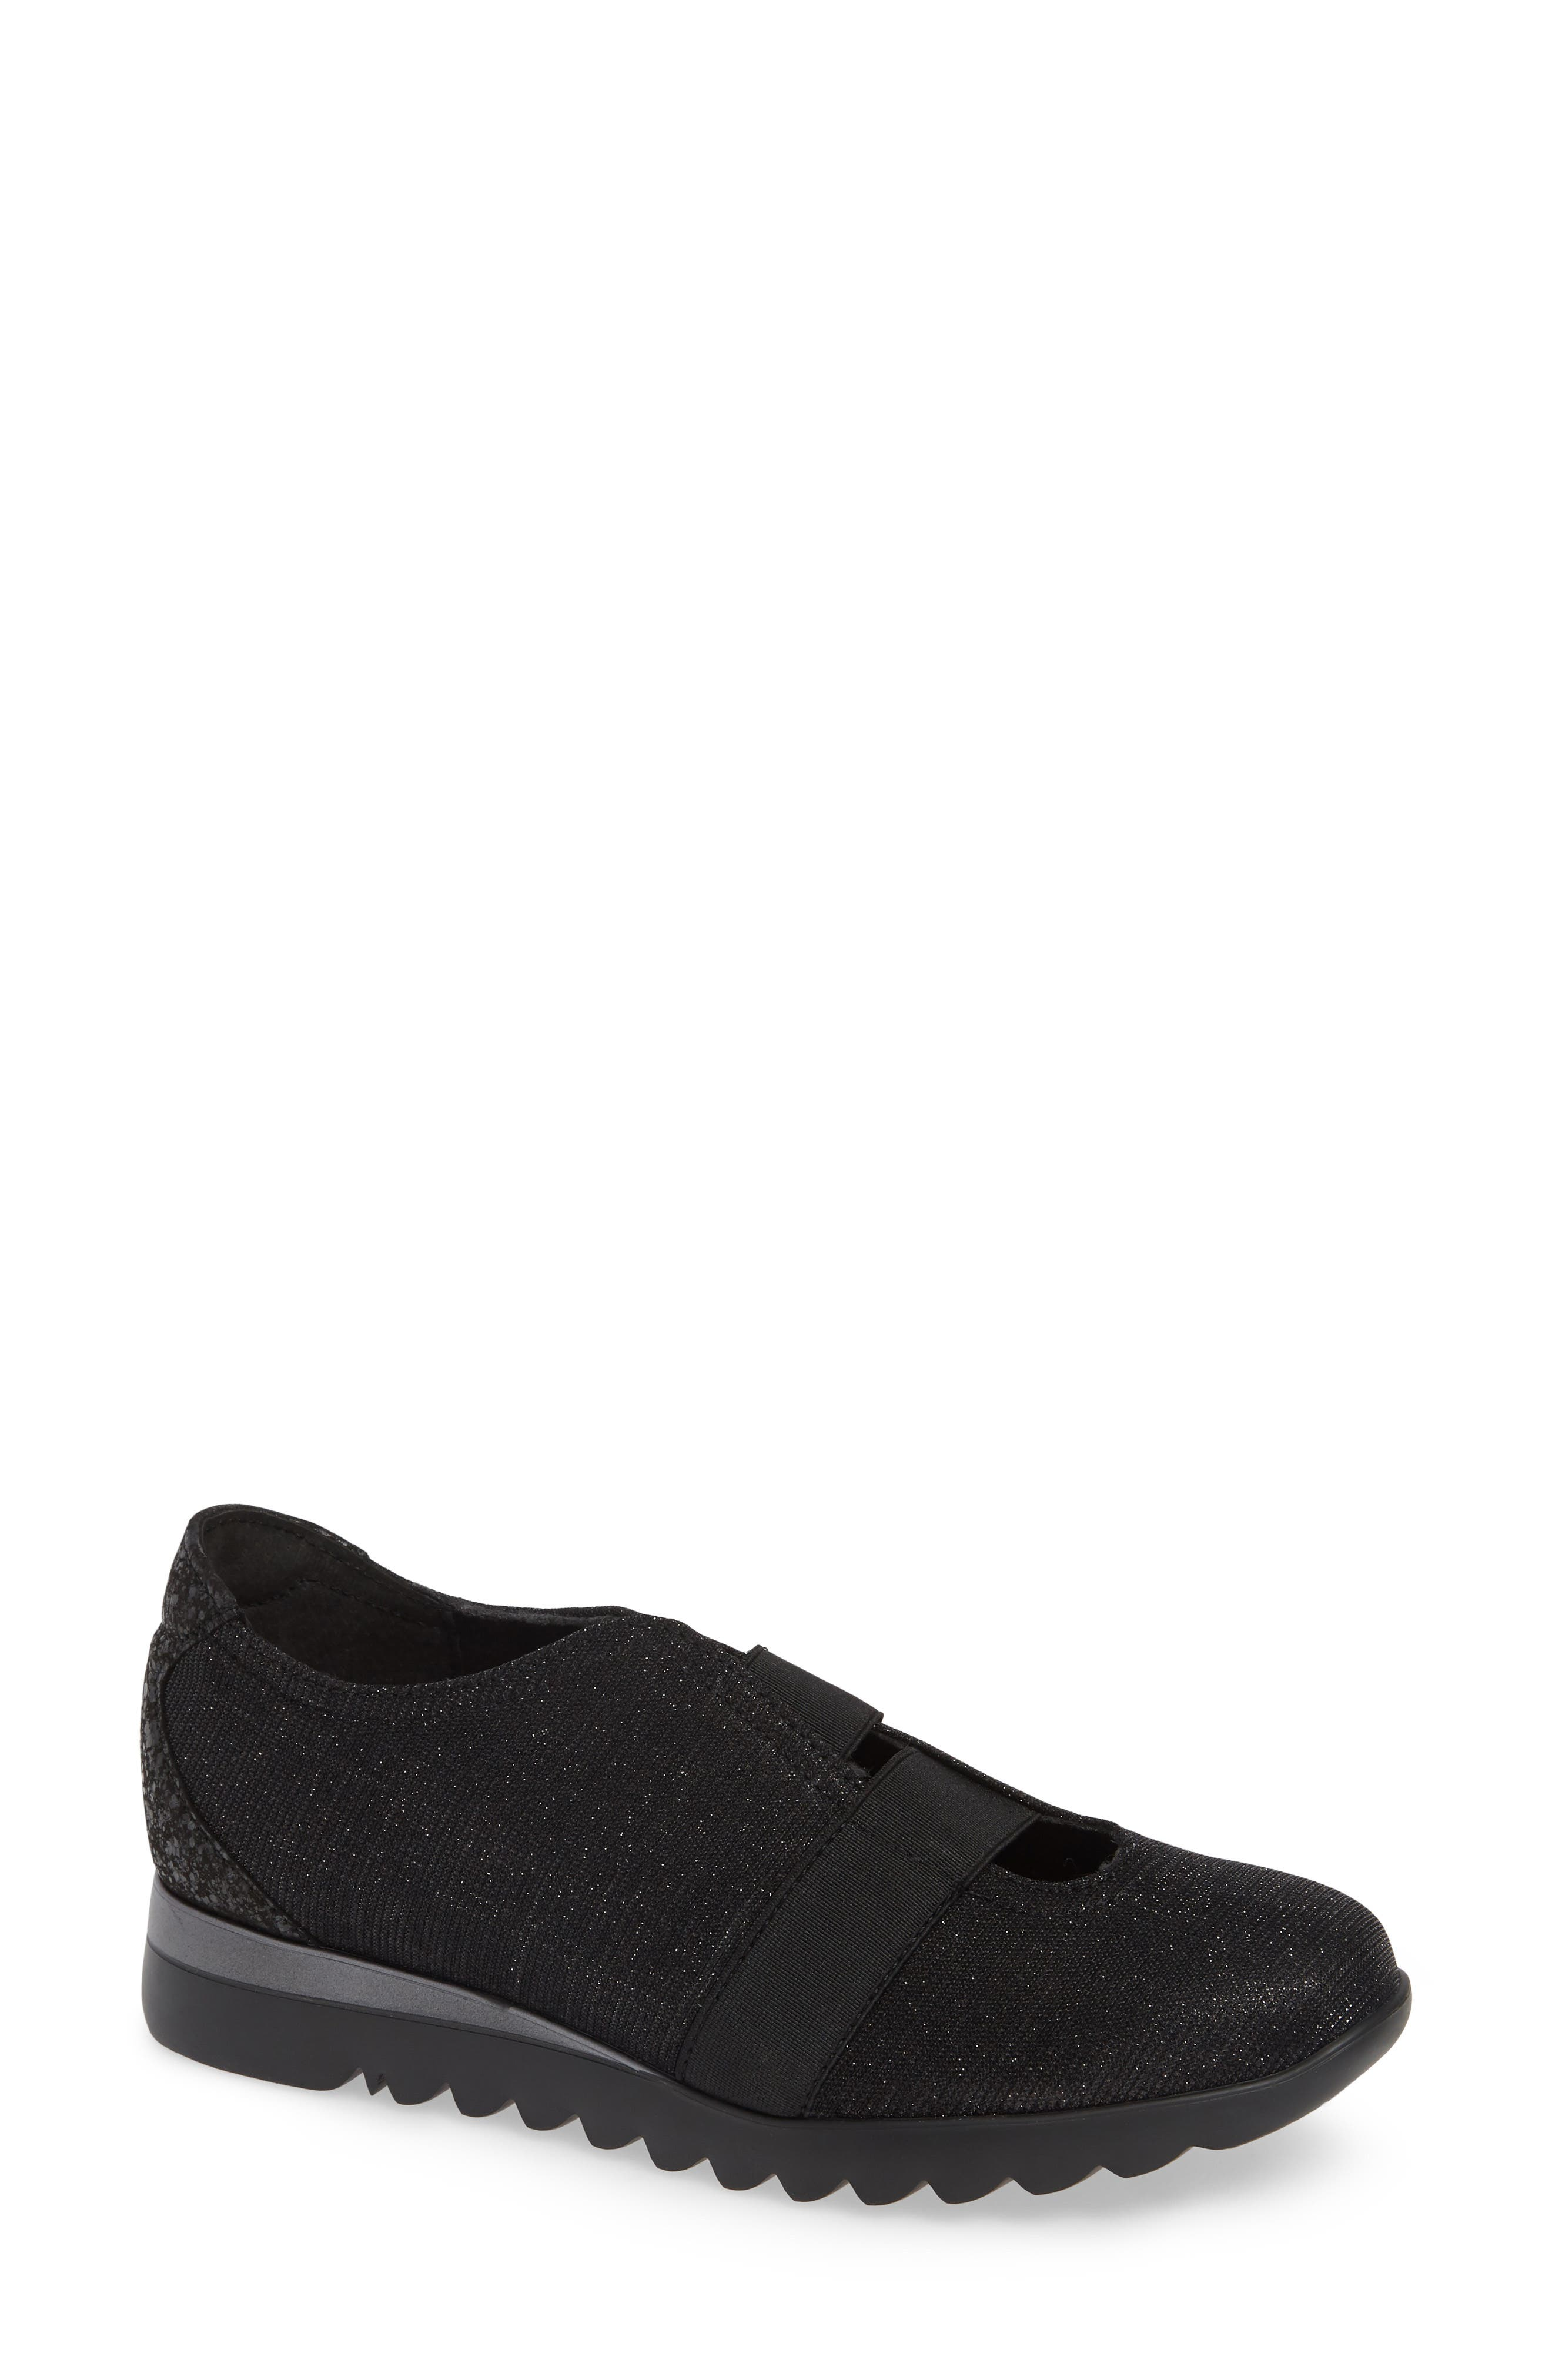 MUNRO, Alta Slip-On Sneaker, Main thumbnail 1, color, BLACK SPARKLE FABRIC